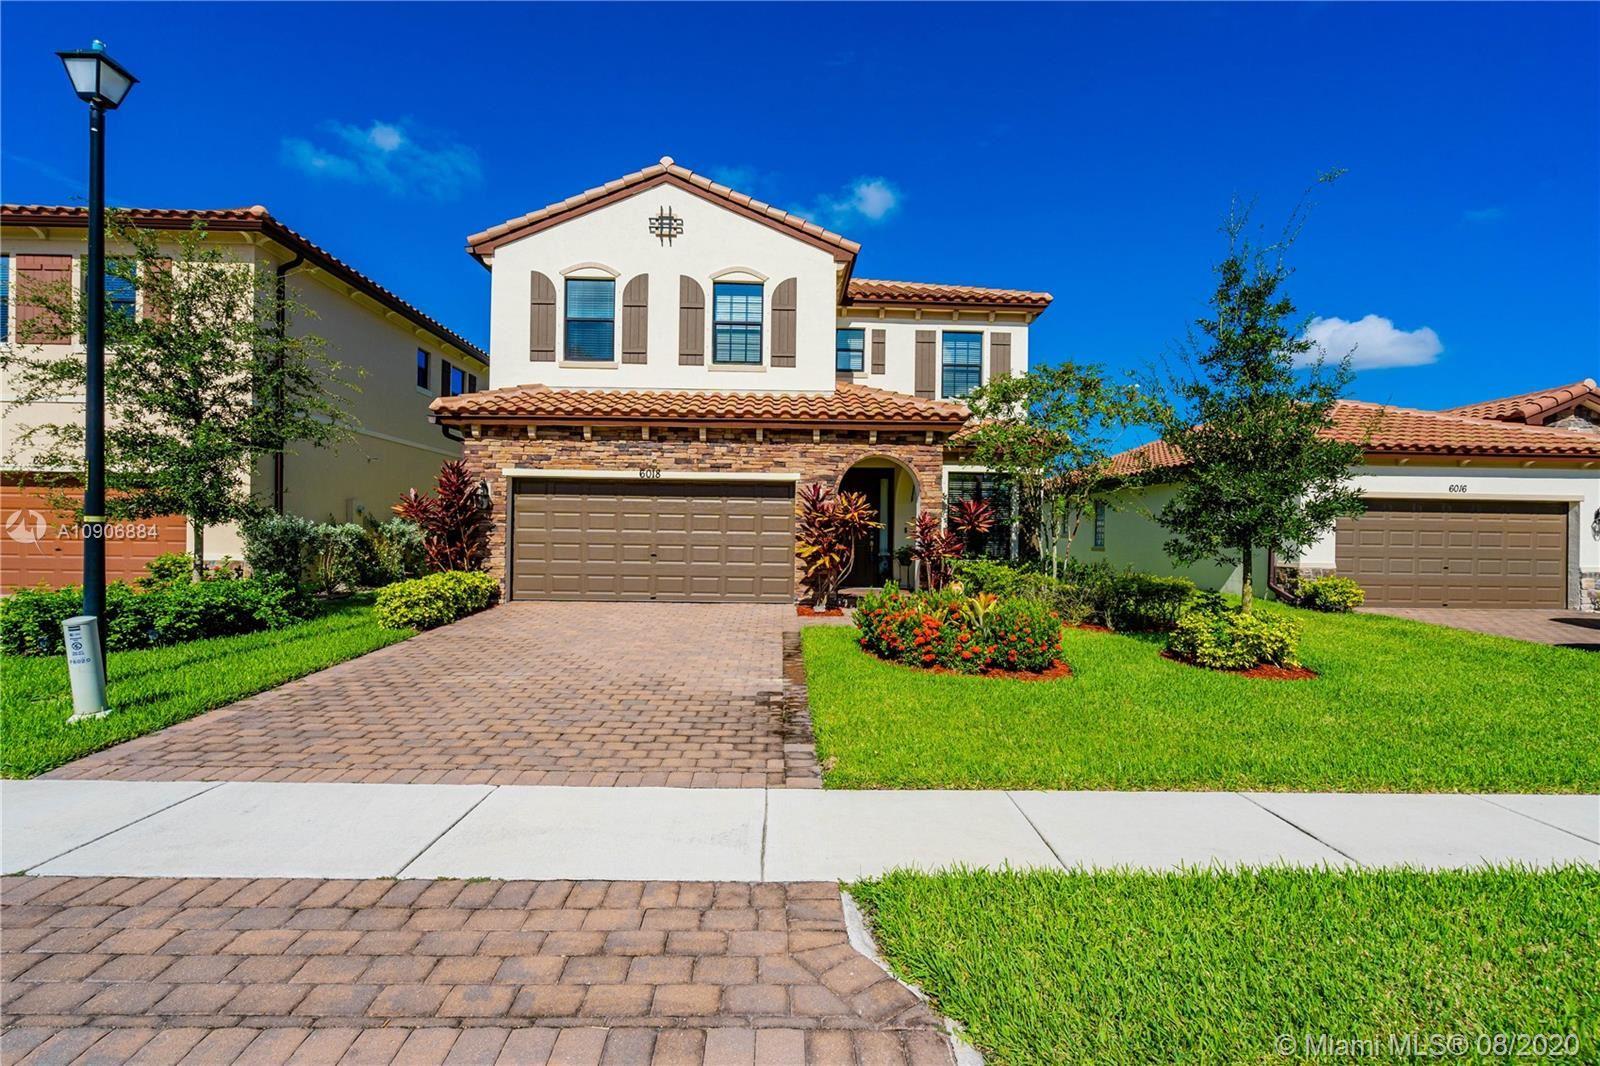 6018 Sandhill Crane Dr, West Palm Beach, FL 33415 - #: A10906884